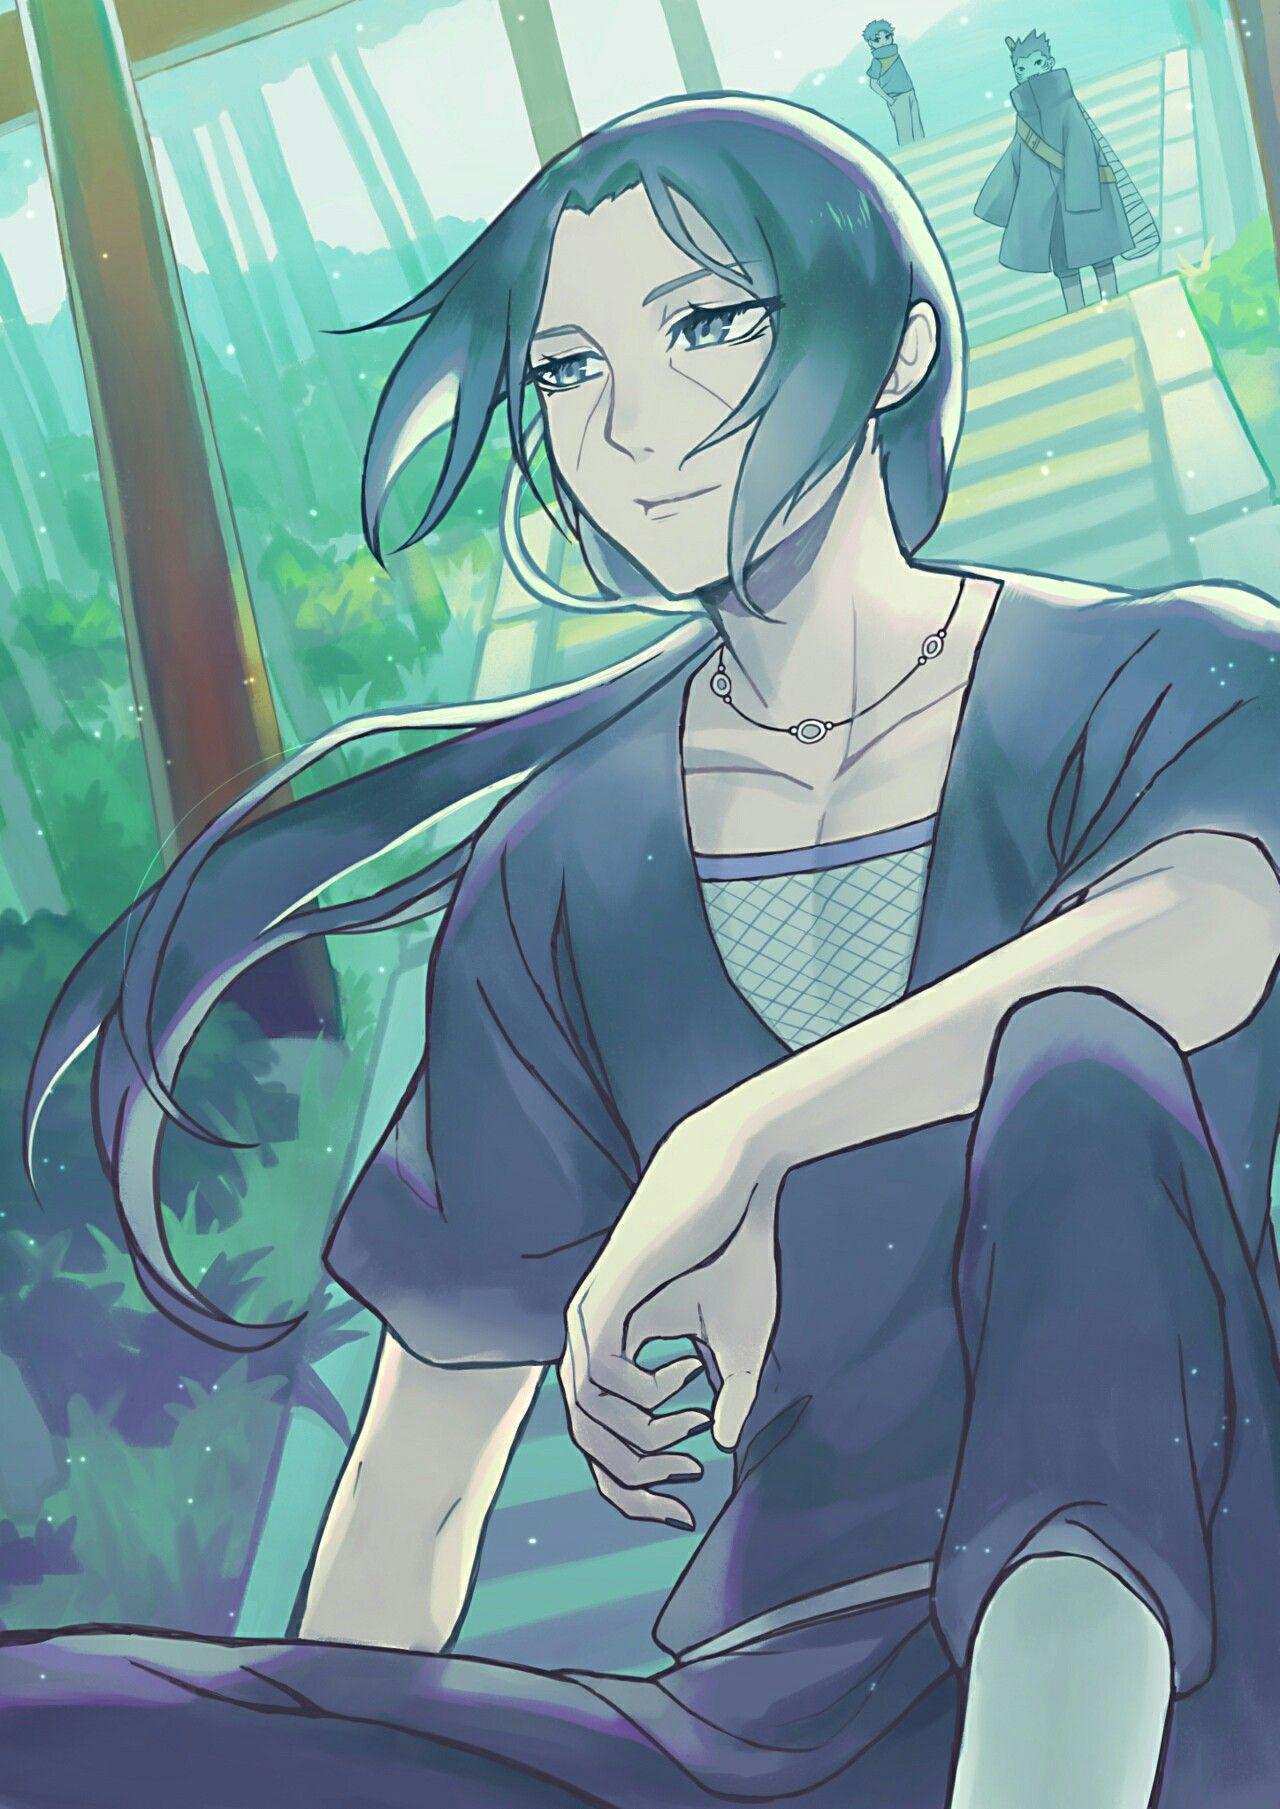 Pin De Itachi San Em Itachi Uchiha Garotos Anime Anime